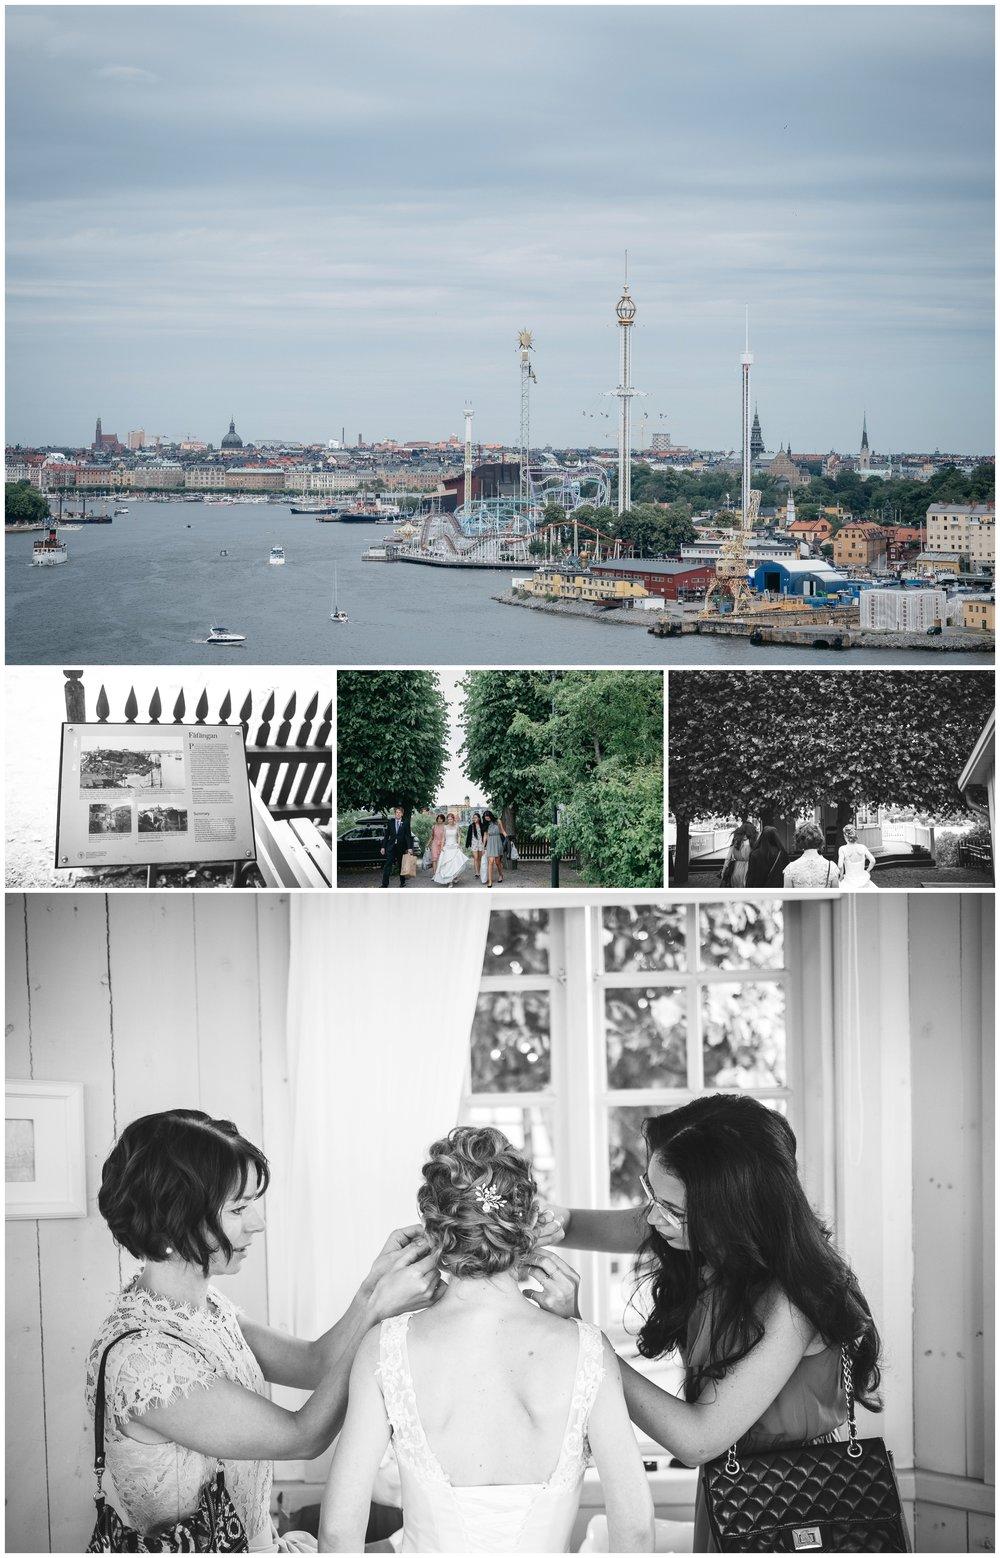 360you-photography-brollopsfotograf-fafangan-stockholm-vallentuna-taby-j-j1.jpg